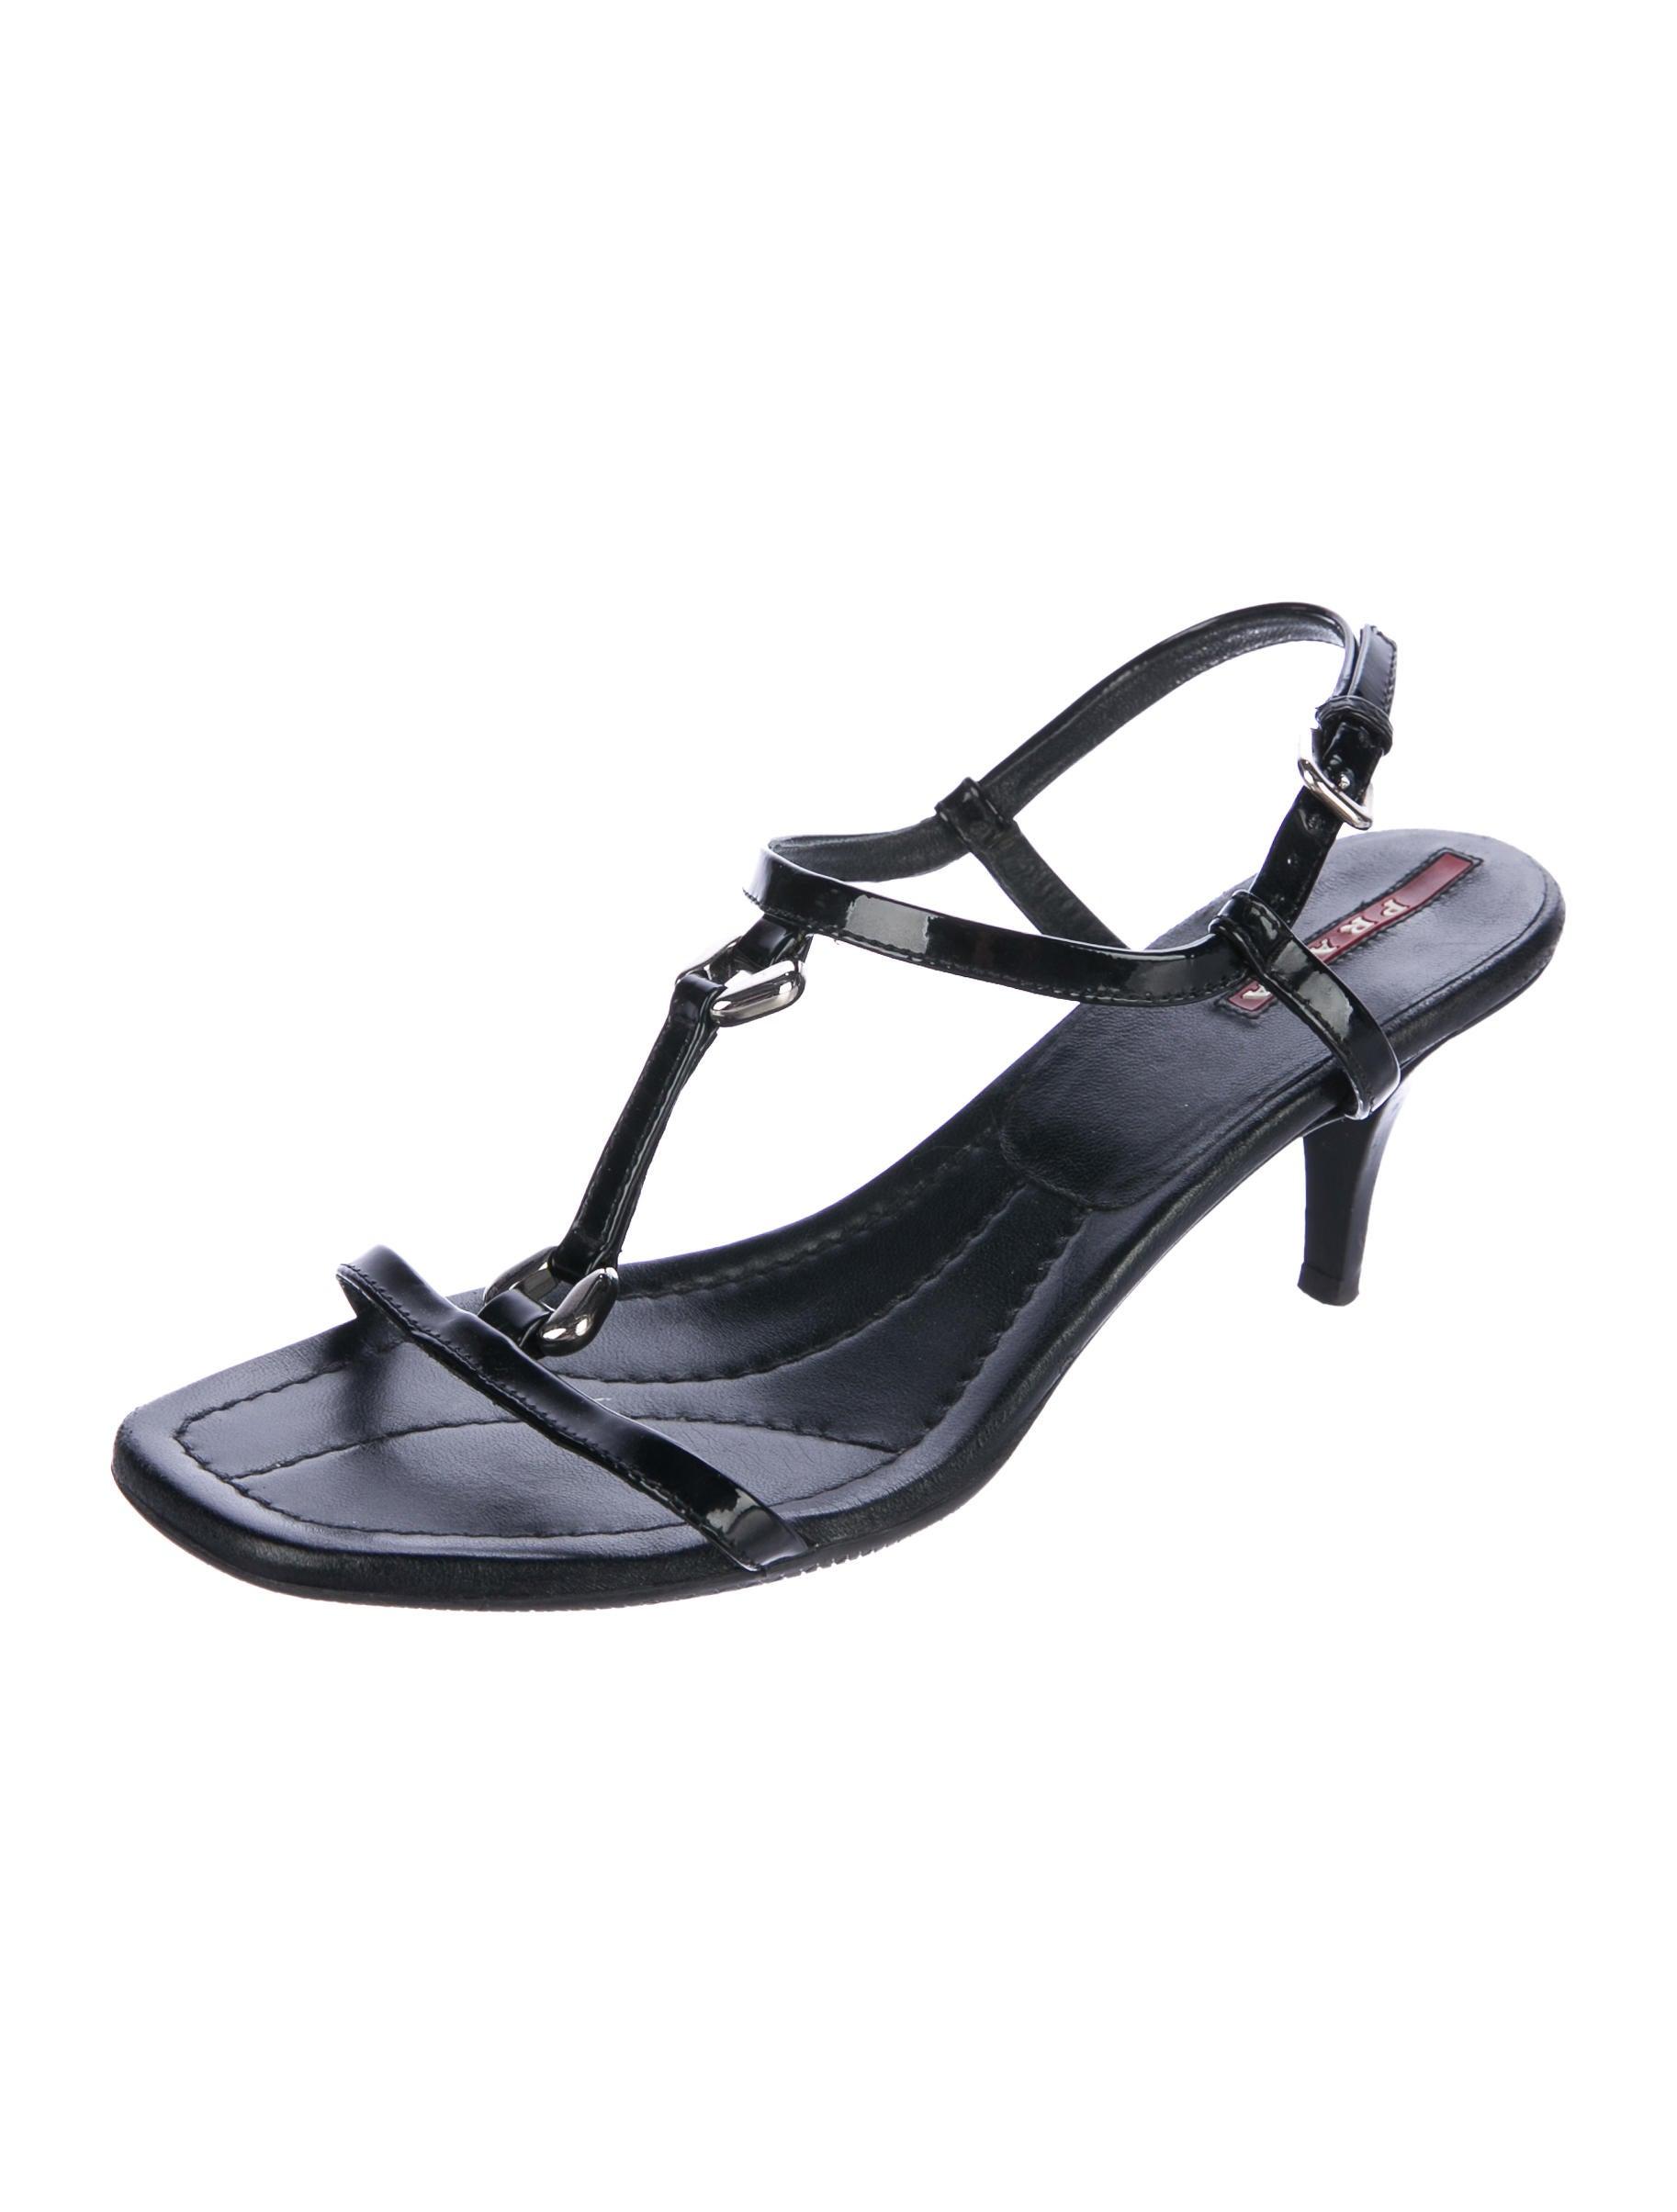 Prada Sport Patent Leather T-Strap Sandals buy cheap Manchester RkrwWIM